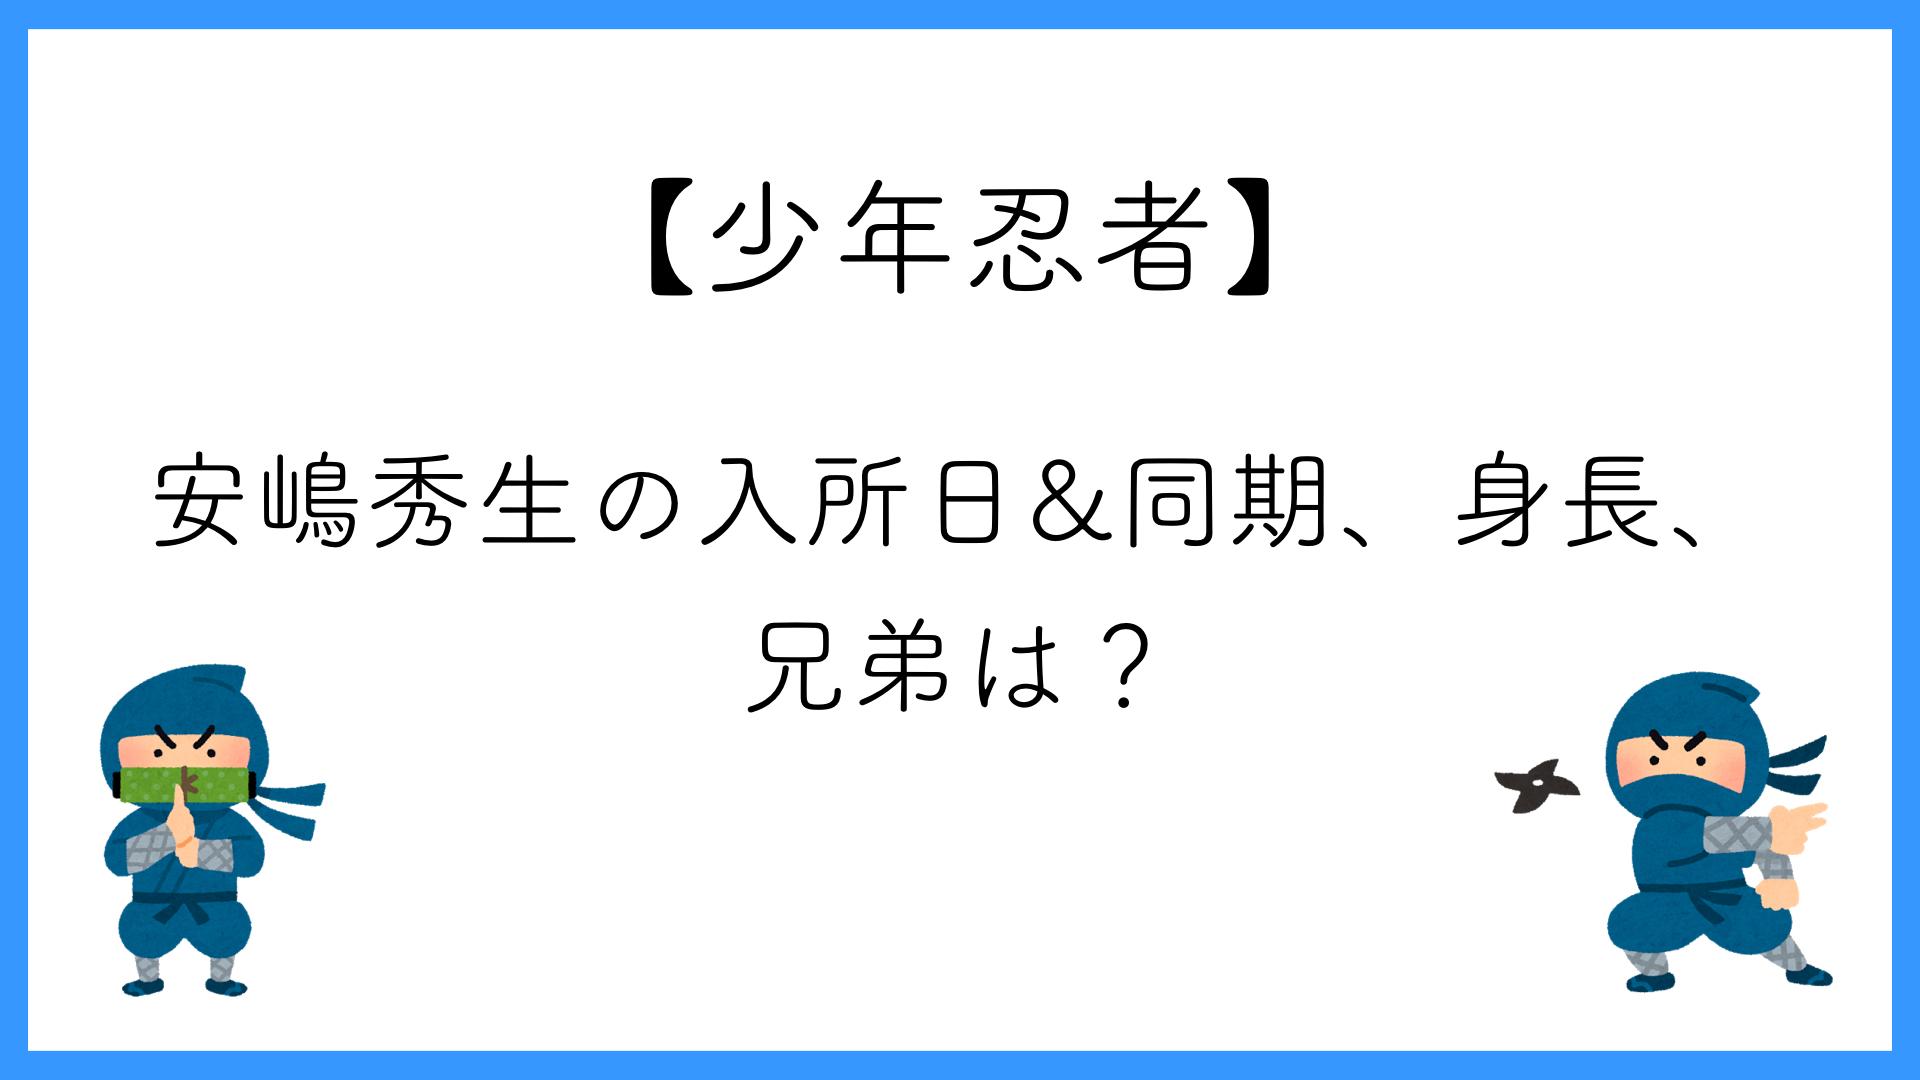 【少年忍者】安嶋秀生の入所日&同期、身長、兄弟は?